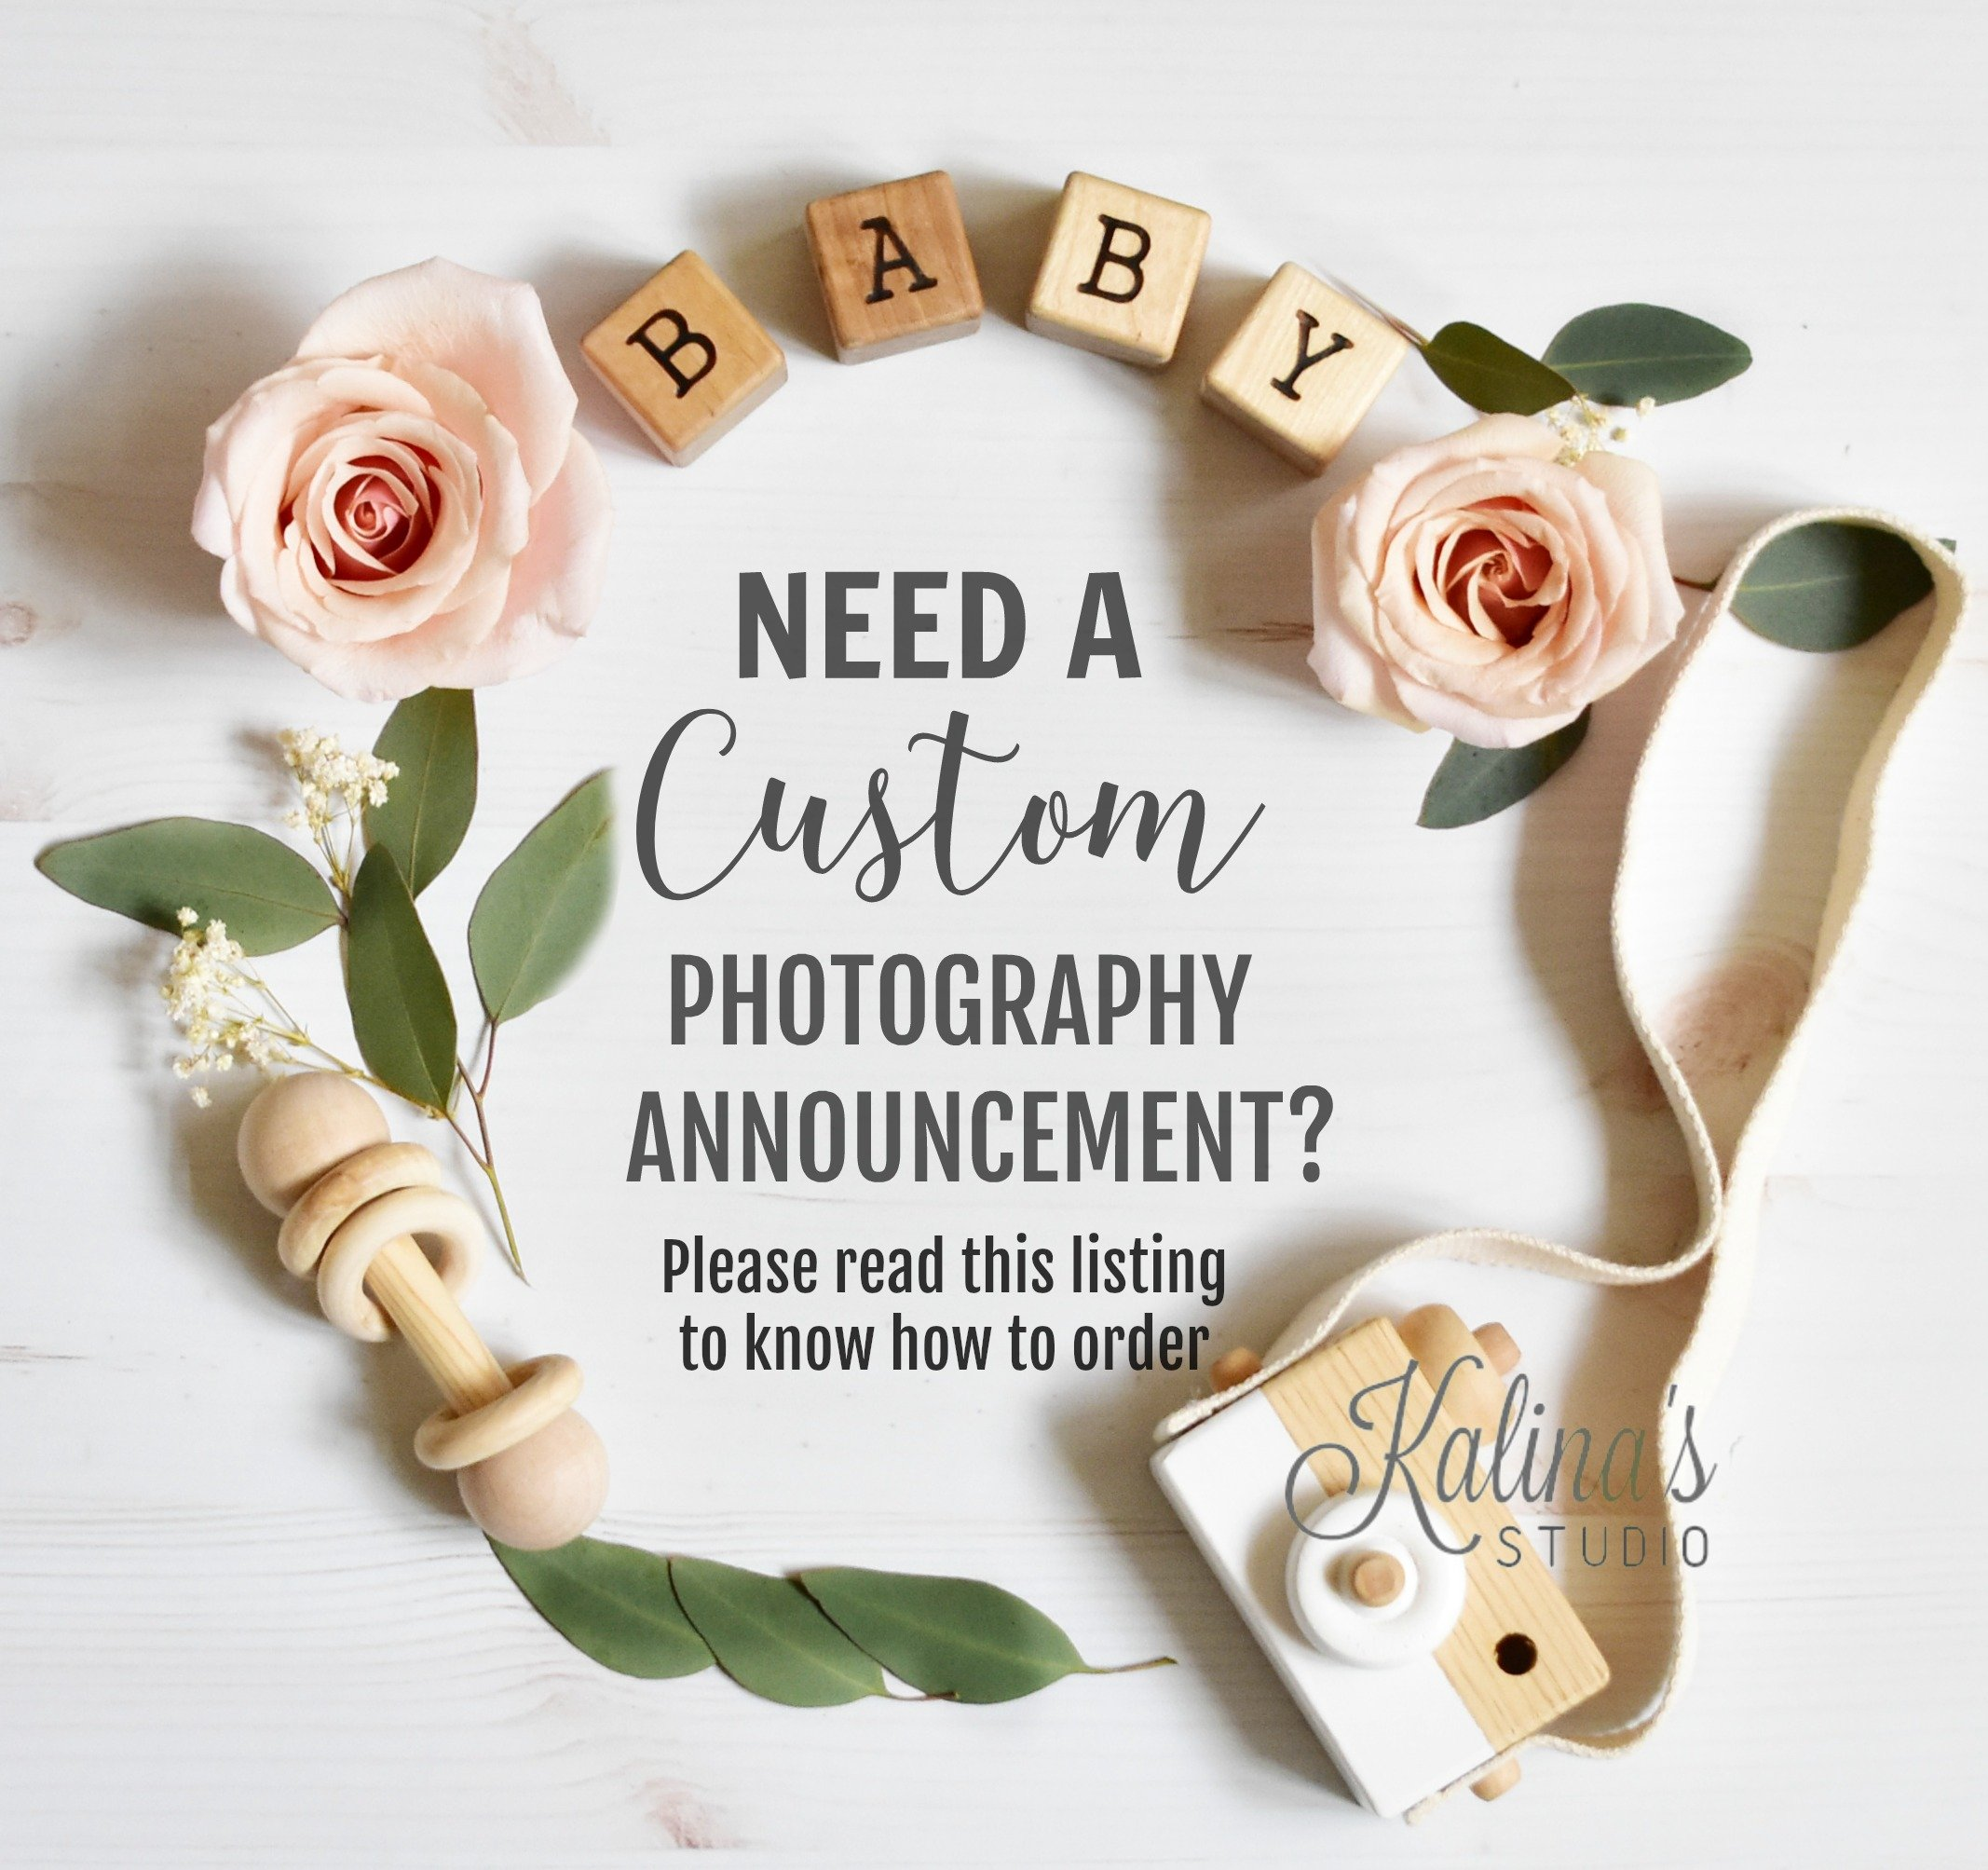 custompregnancyannouncementforsocialmediababyreveal